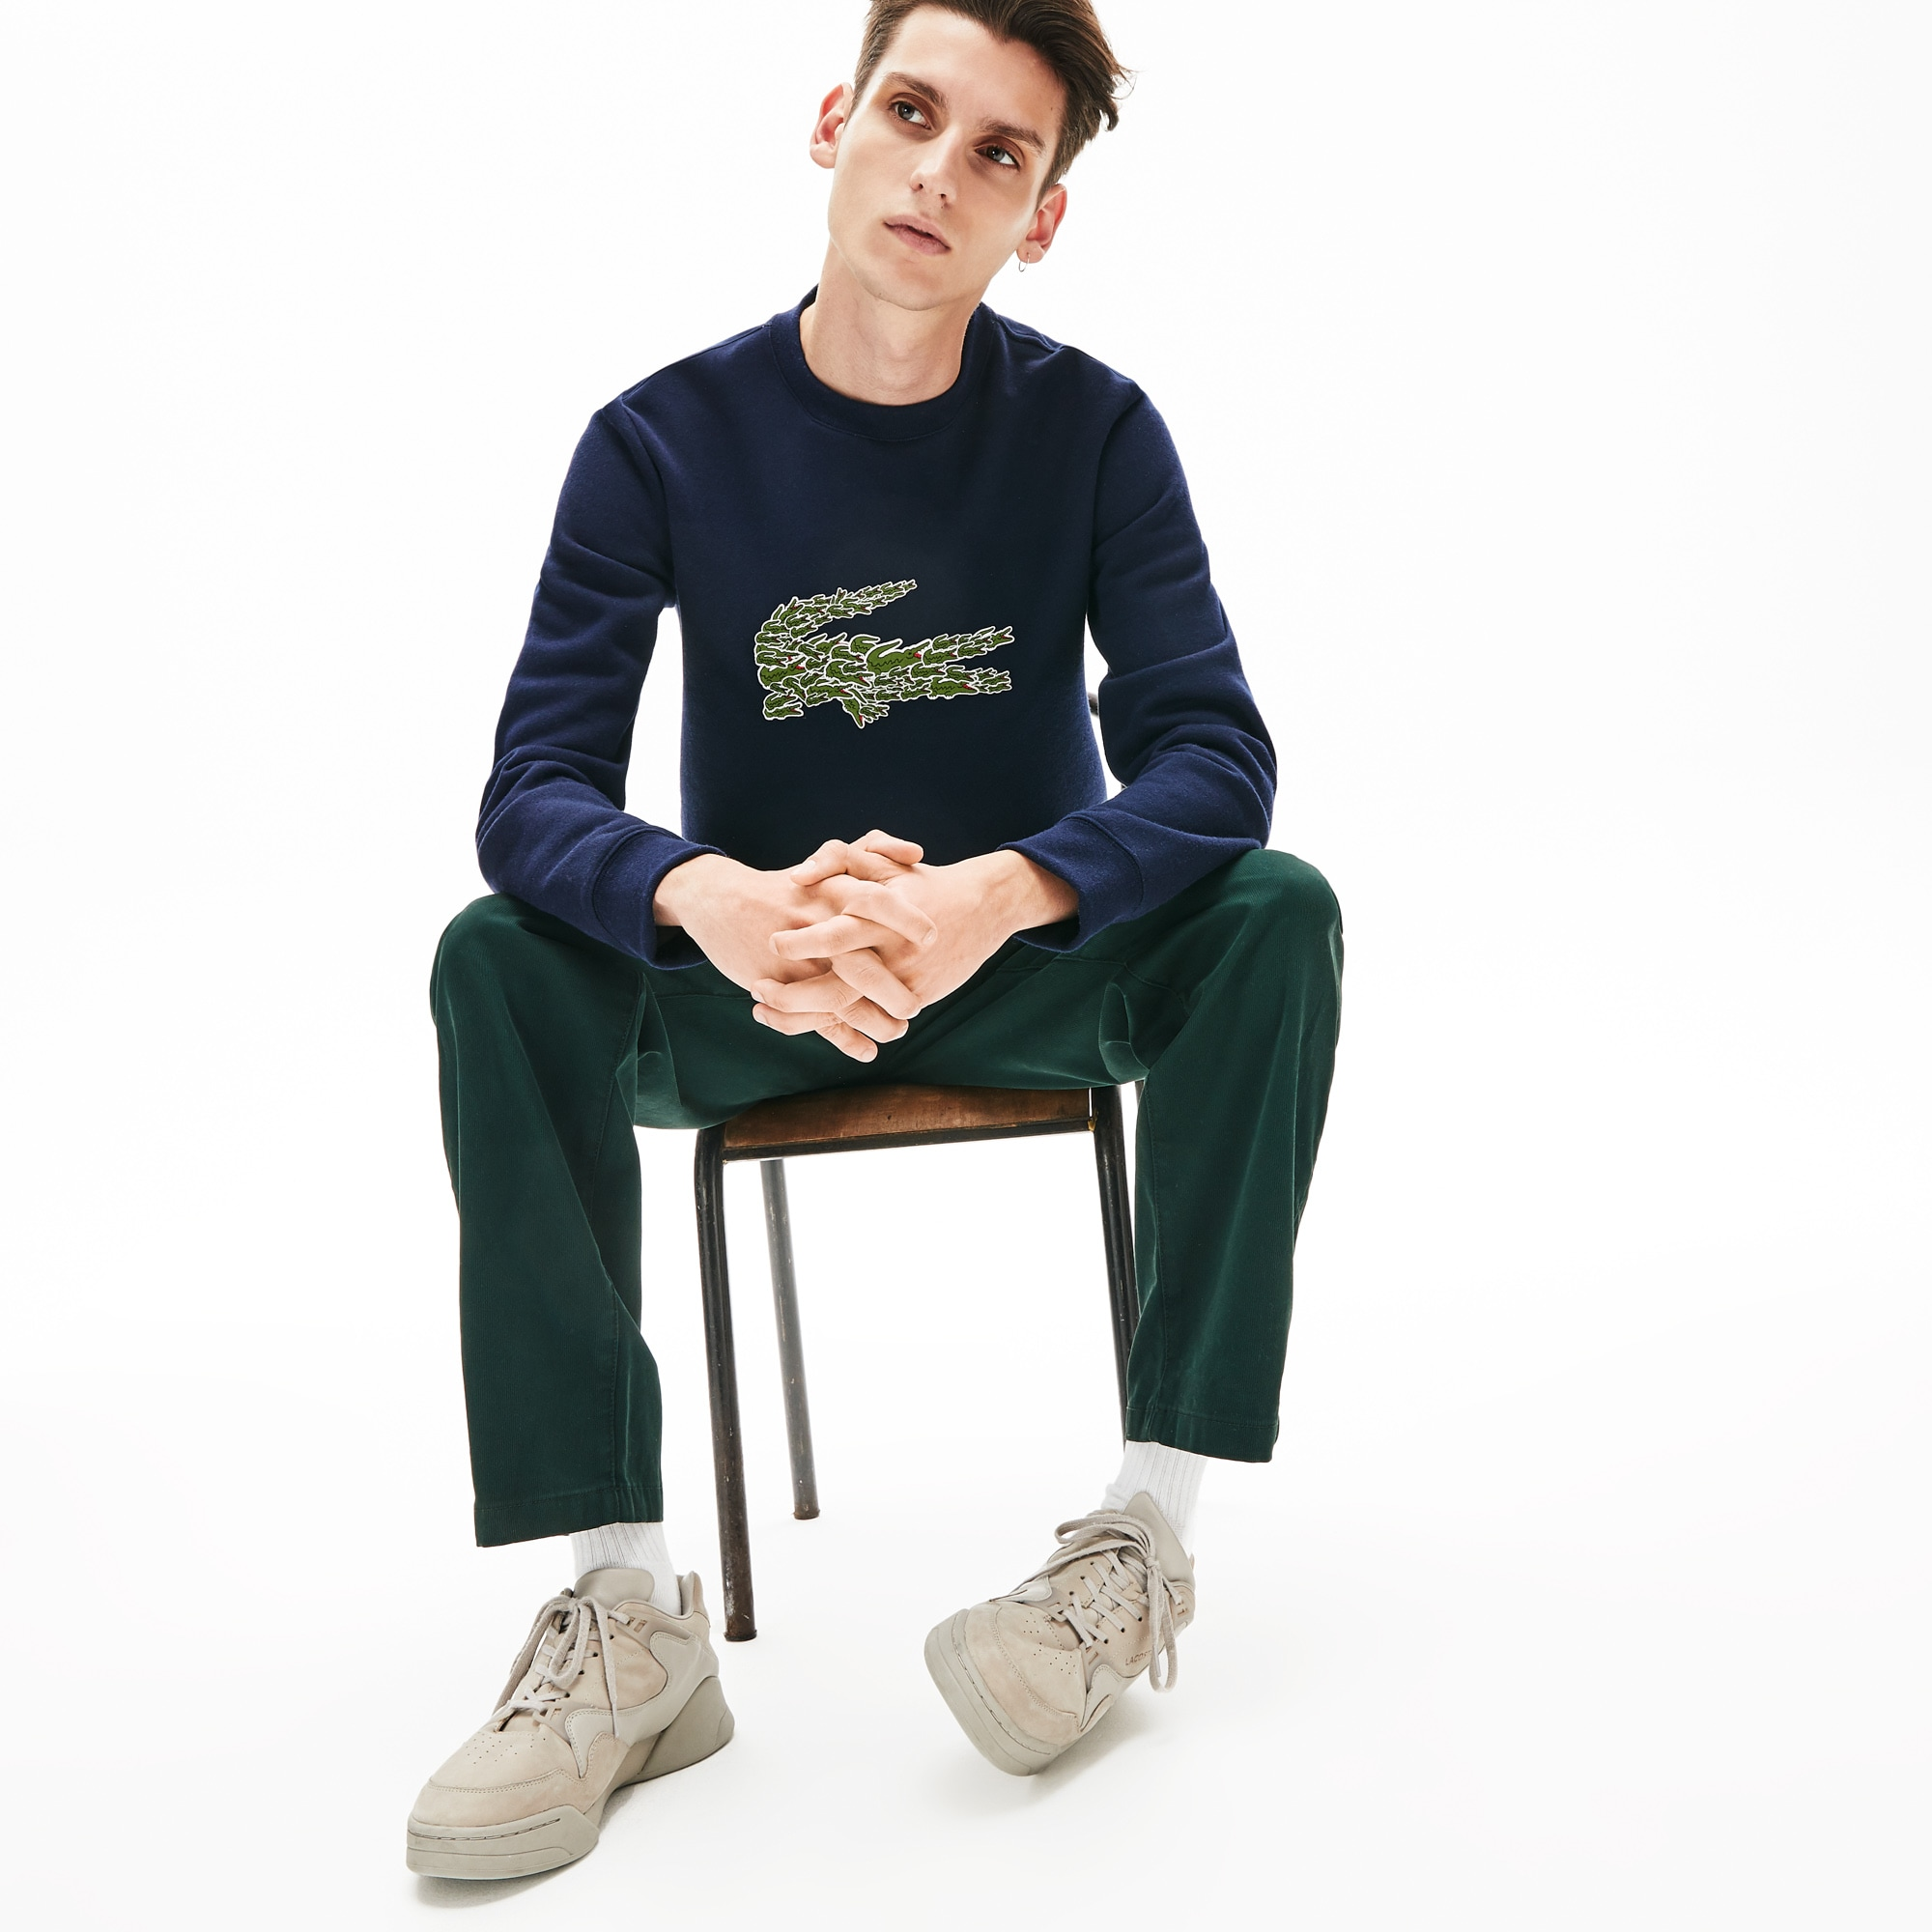 Lacoste Tops Men's Crewneck Croco Magic Logo Fleece Sweatshirt